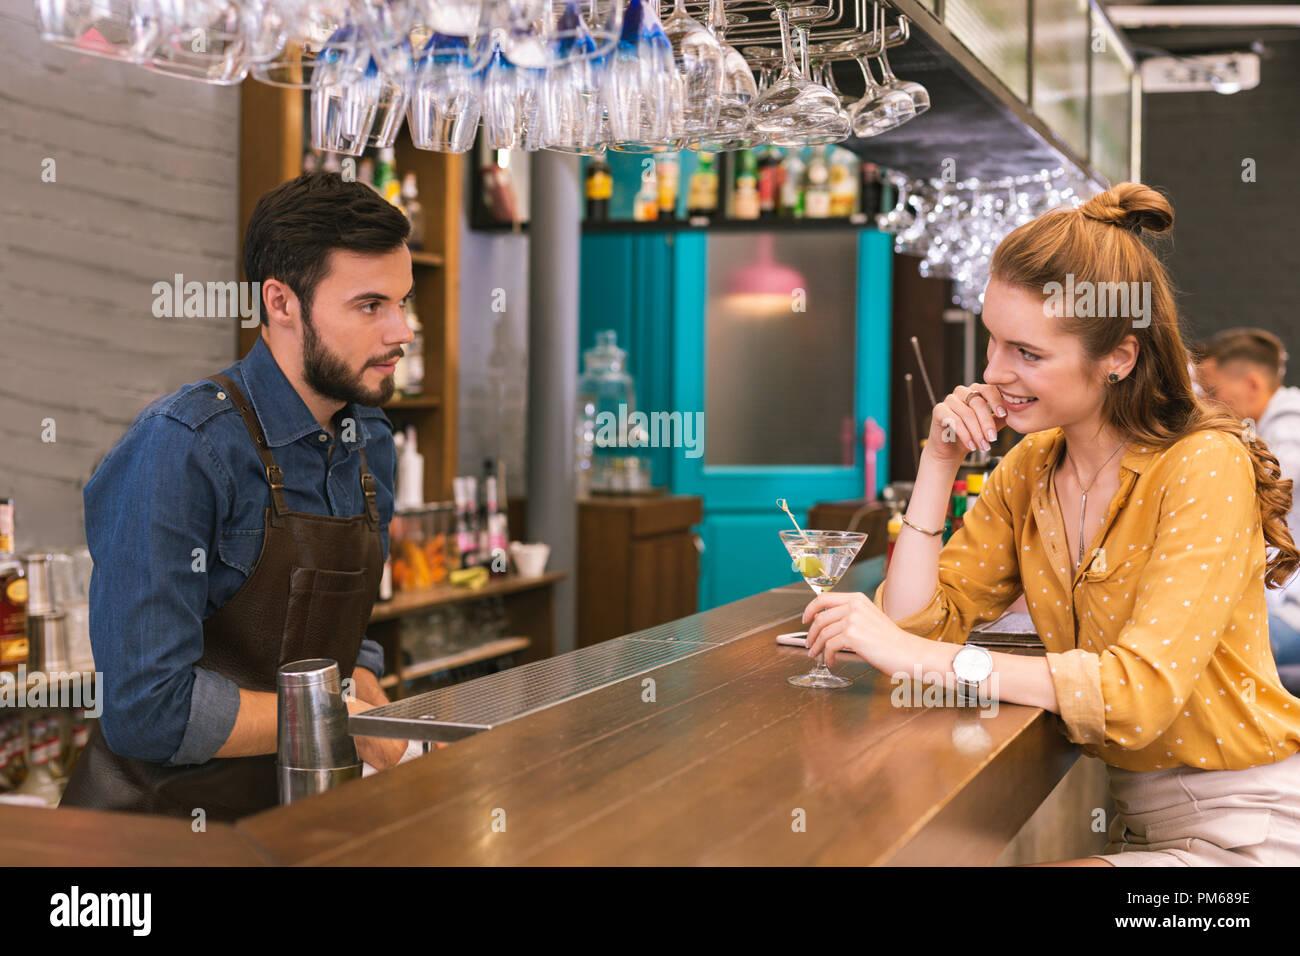 Pretty young girl smiling et flirter avec le barman Photo Stock